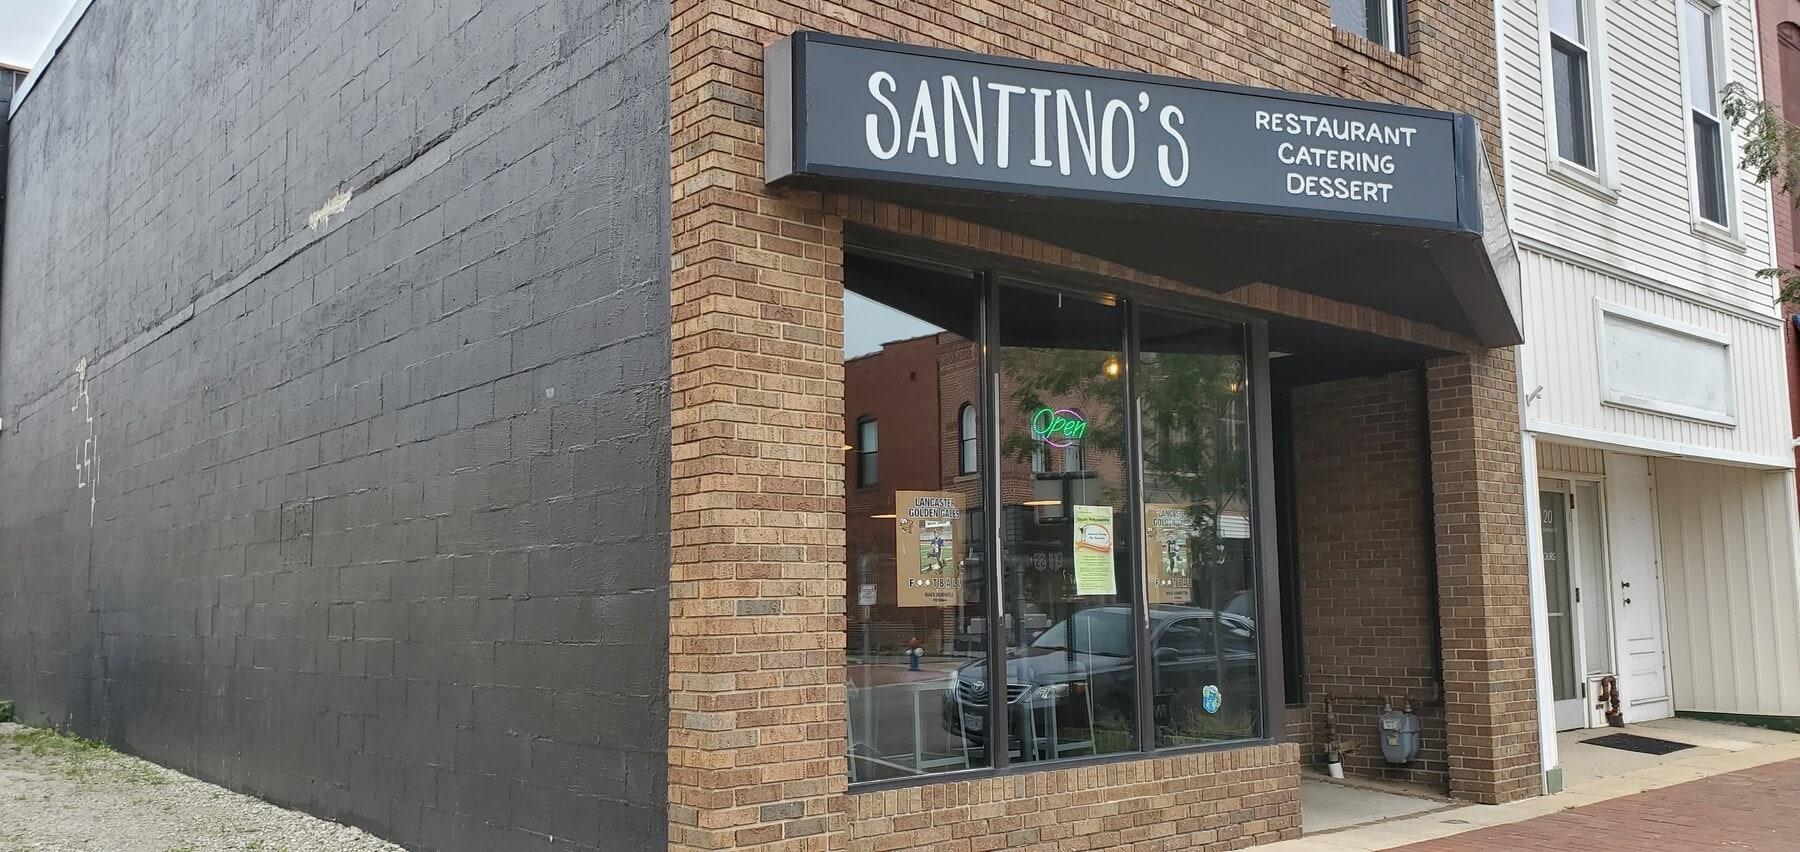 Santino's Restaurant, Catering, Dessert